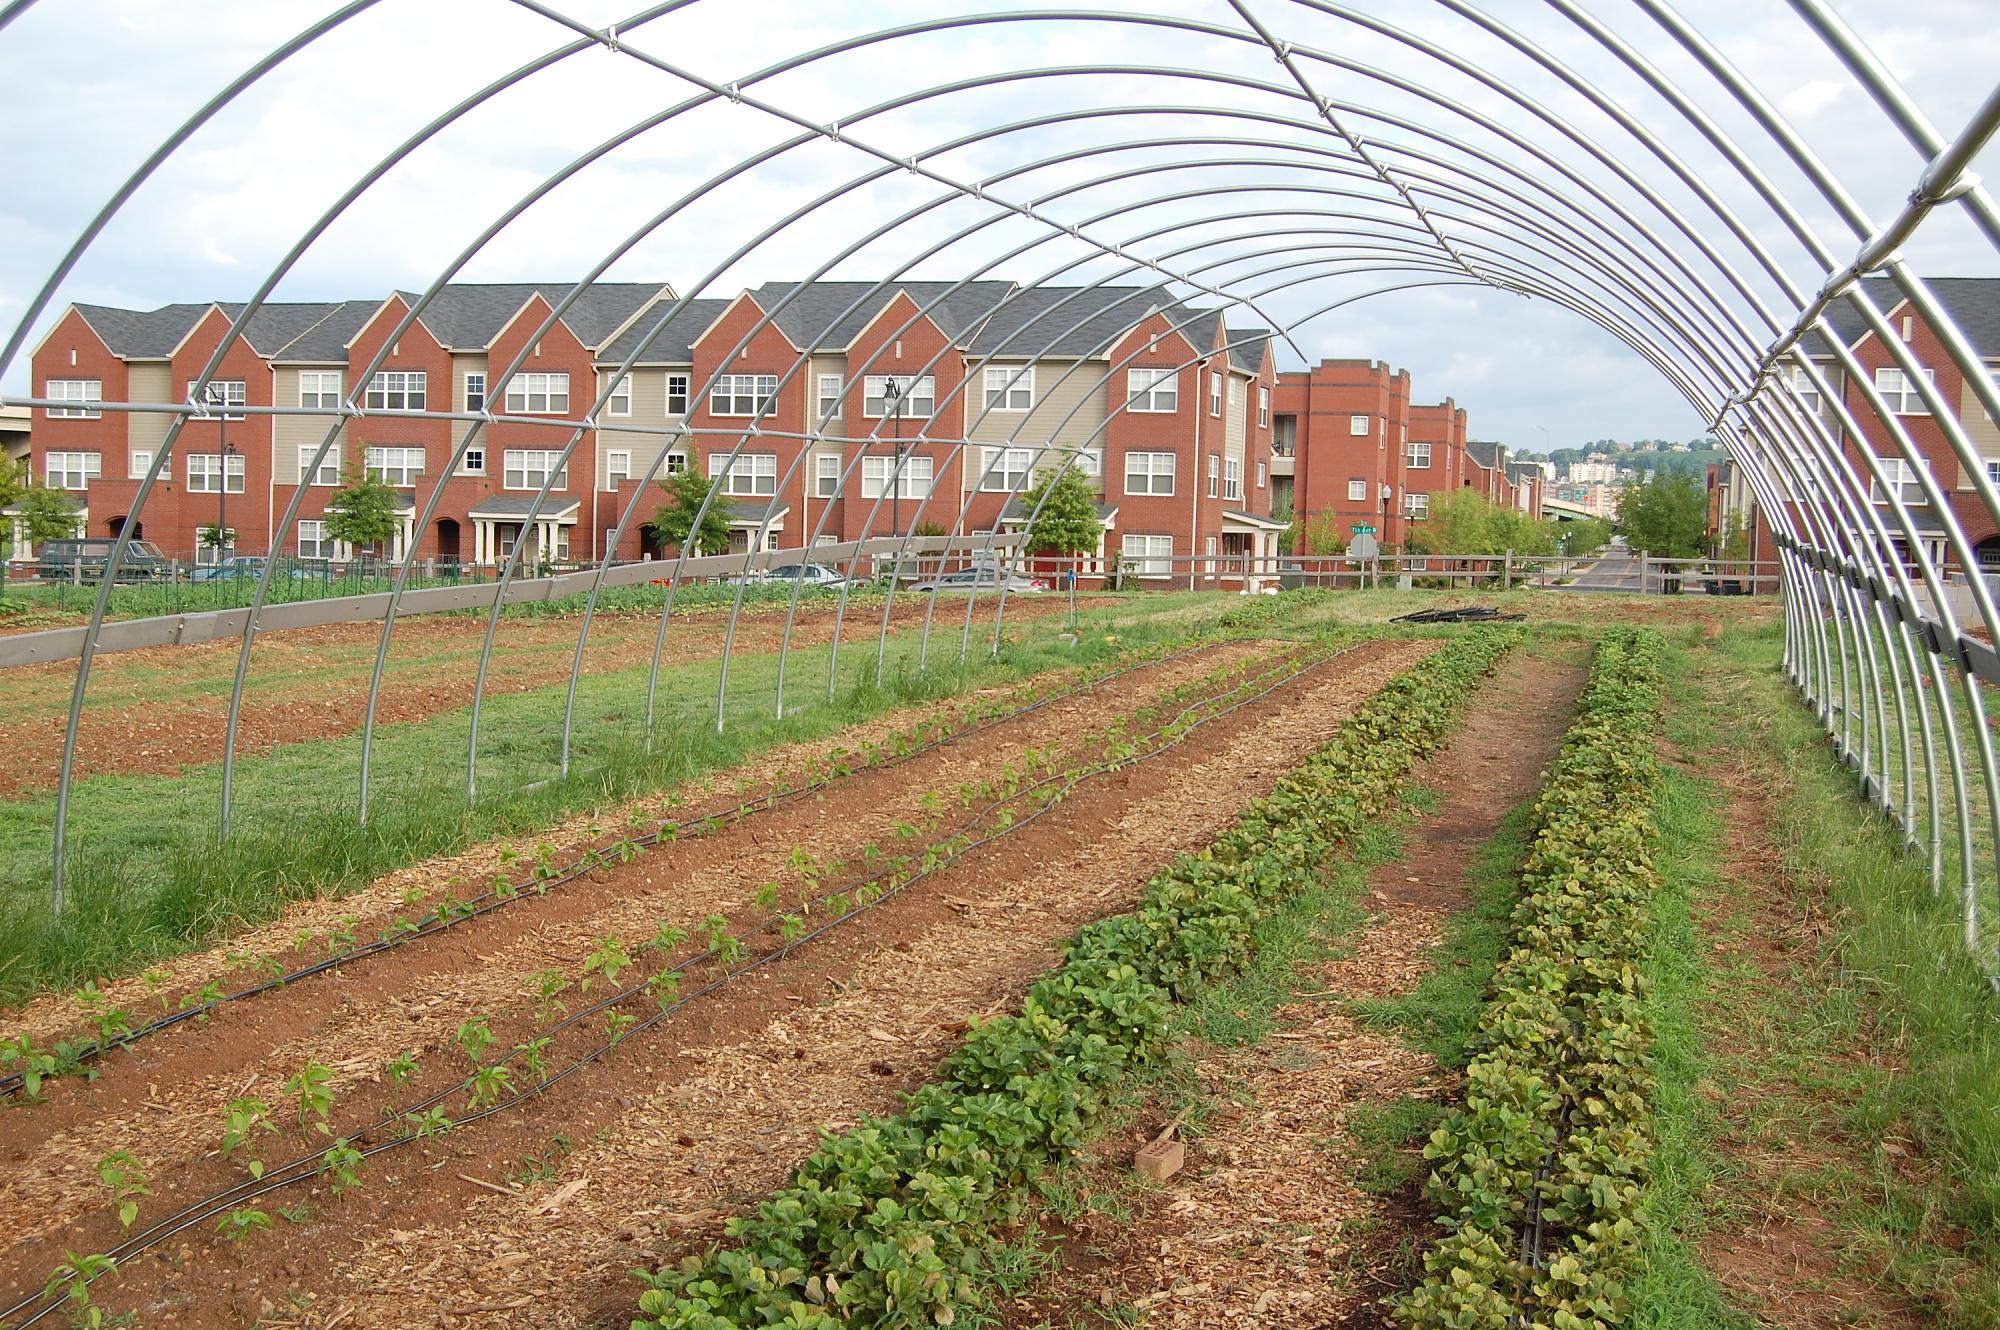 2000s Resurgence of Community Gardens